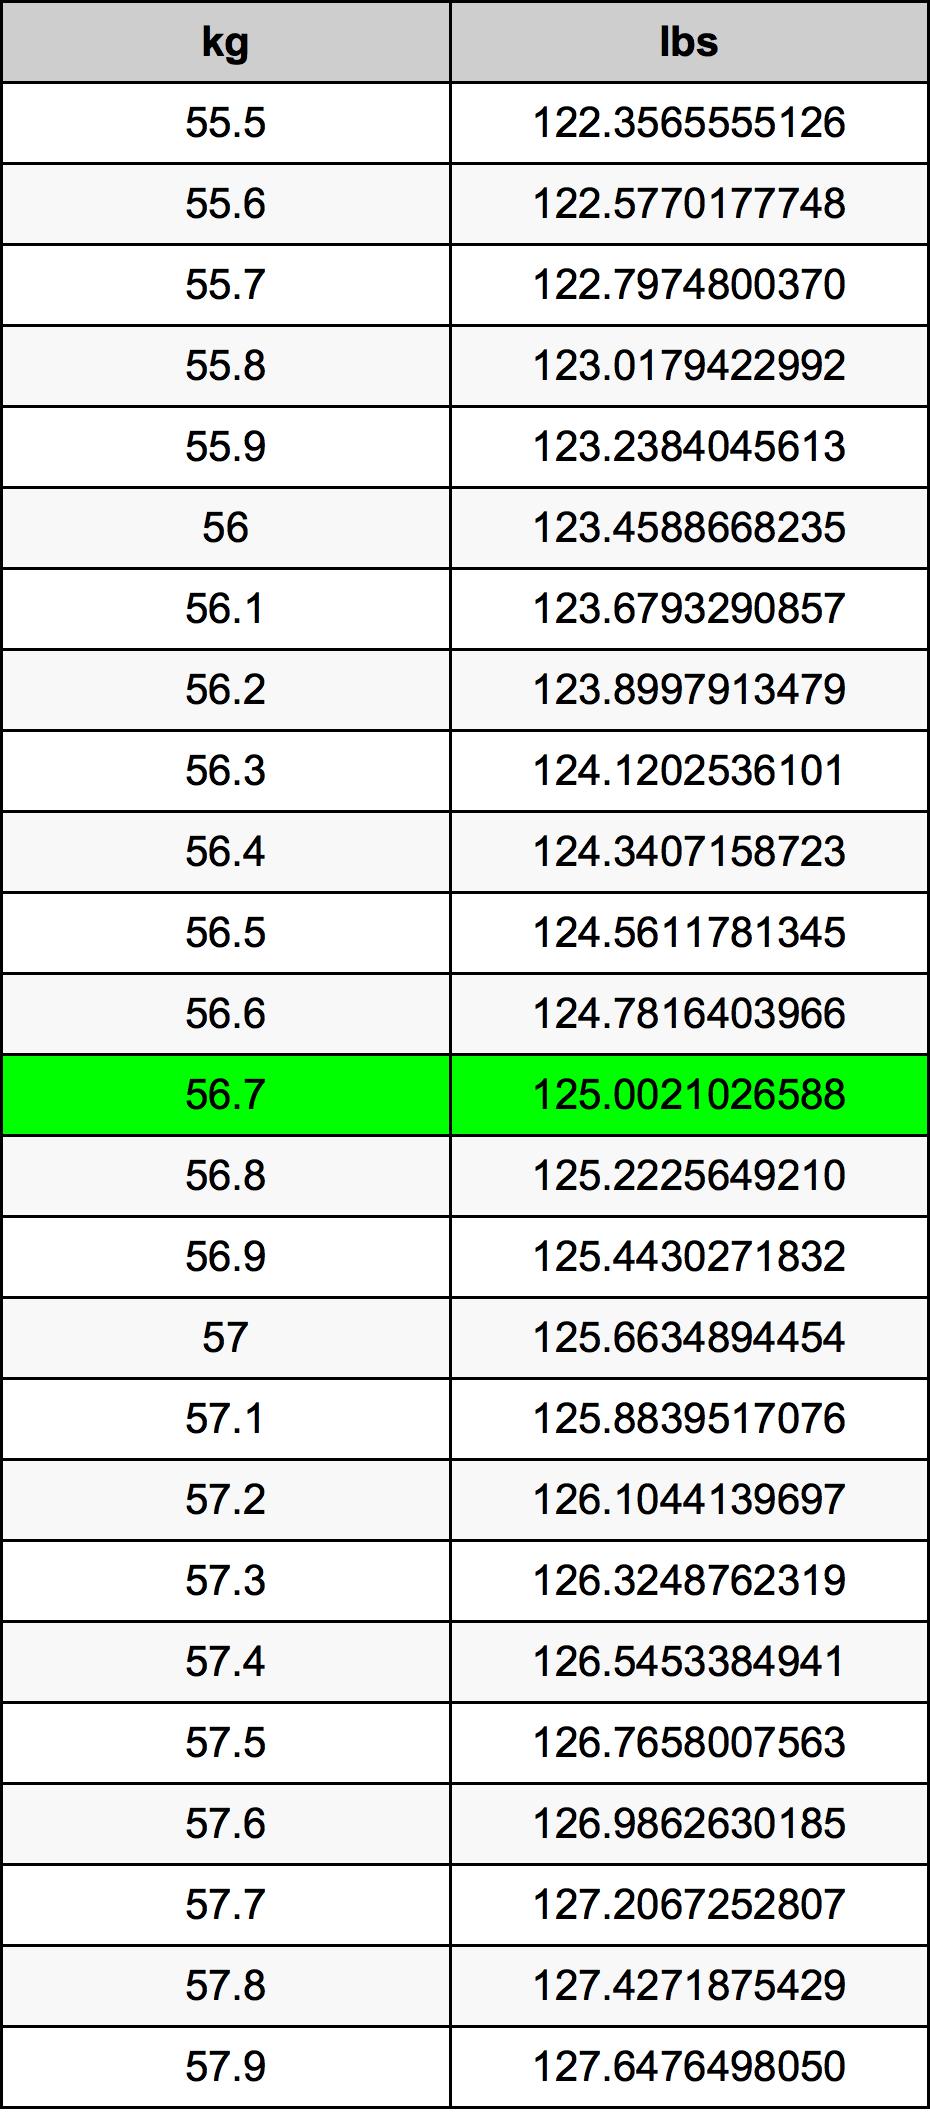 56.7 Kilogramma konverżjoni tabella